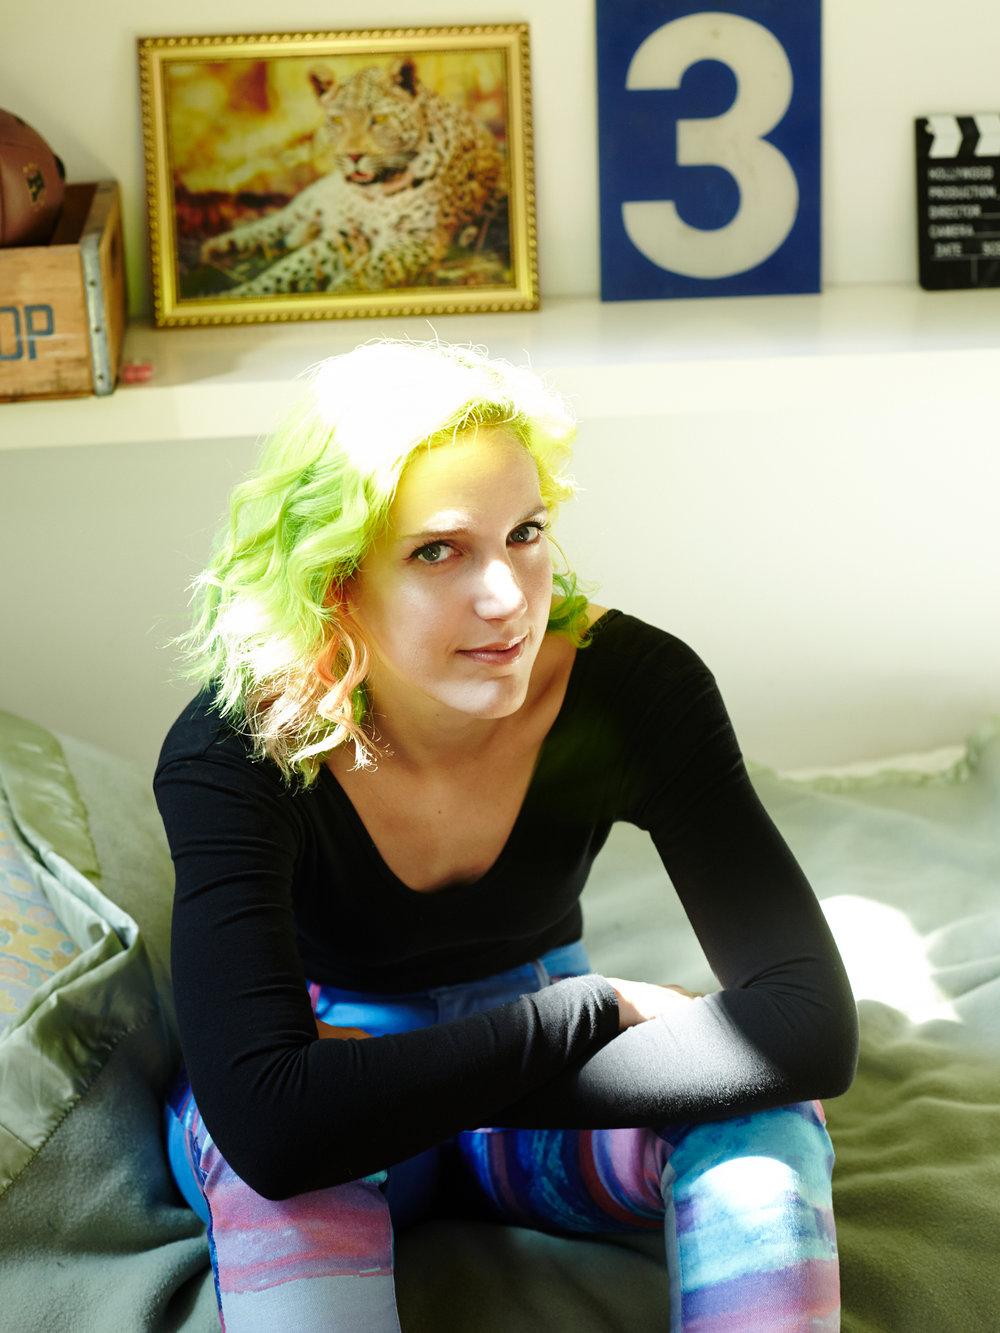 Lizzy Plapginer/Levi's